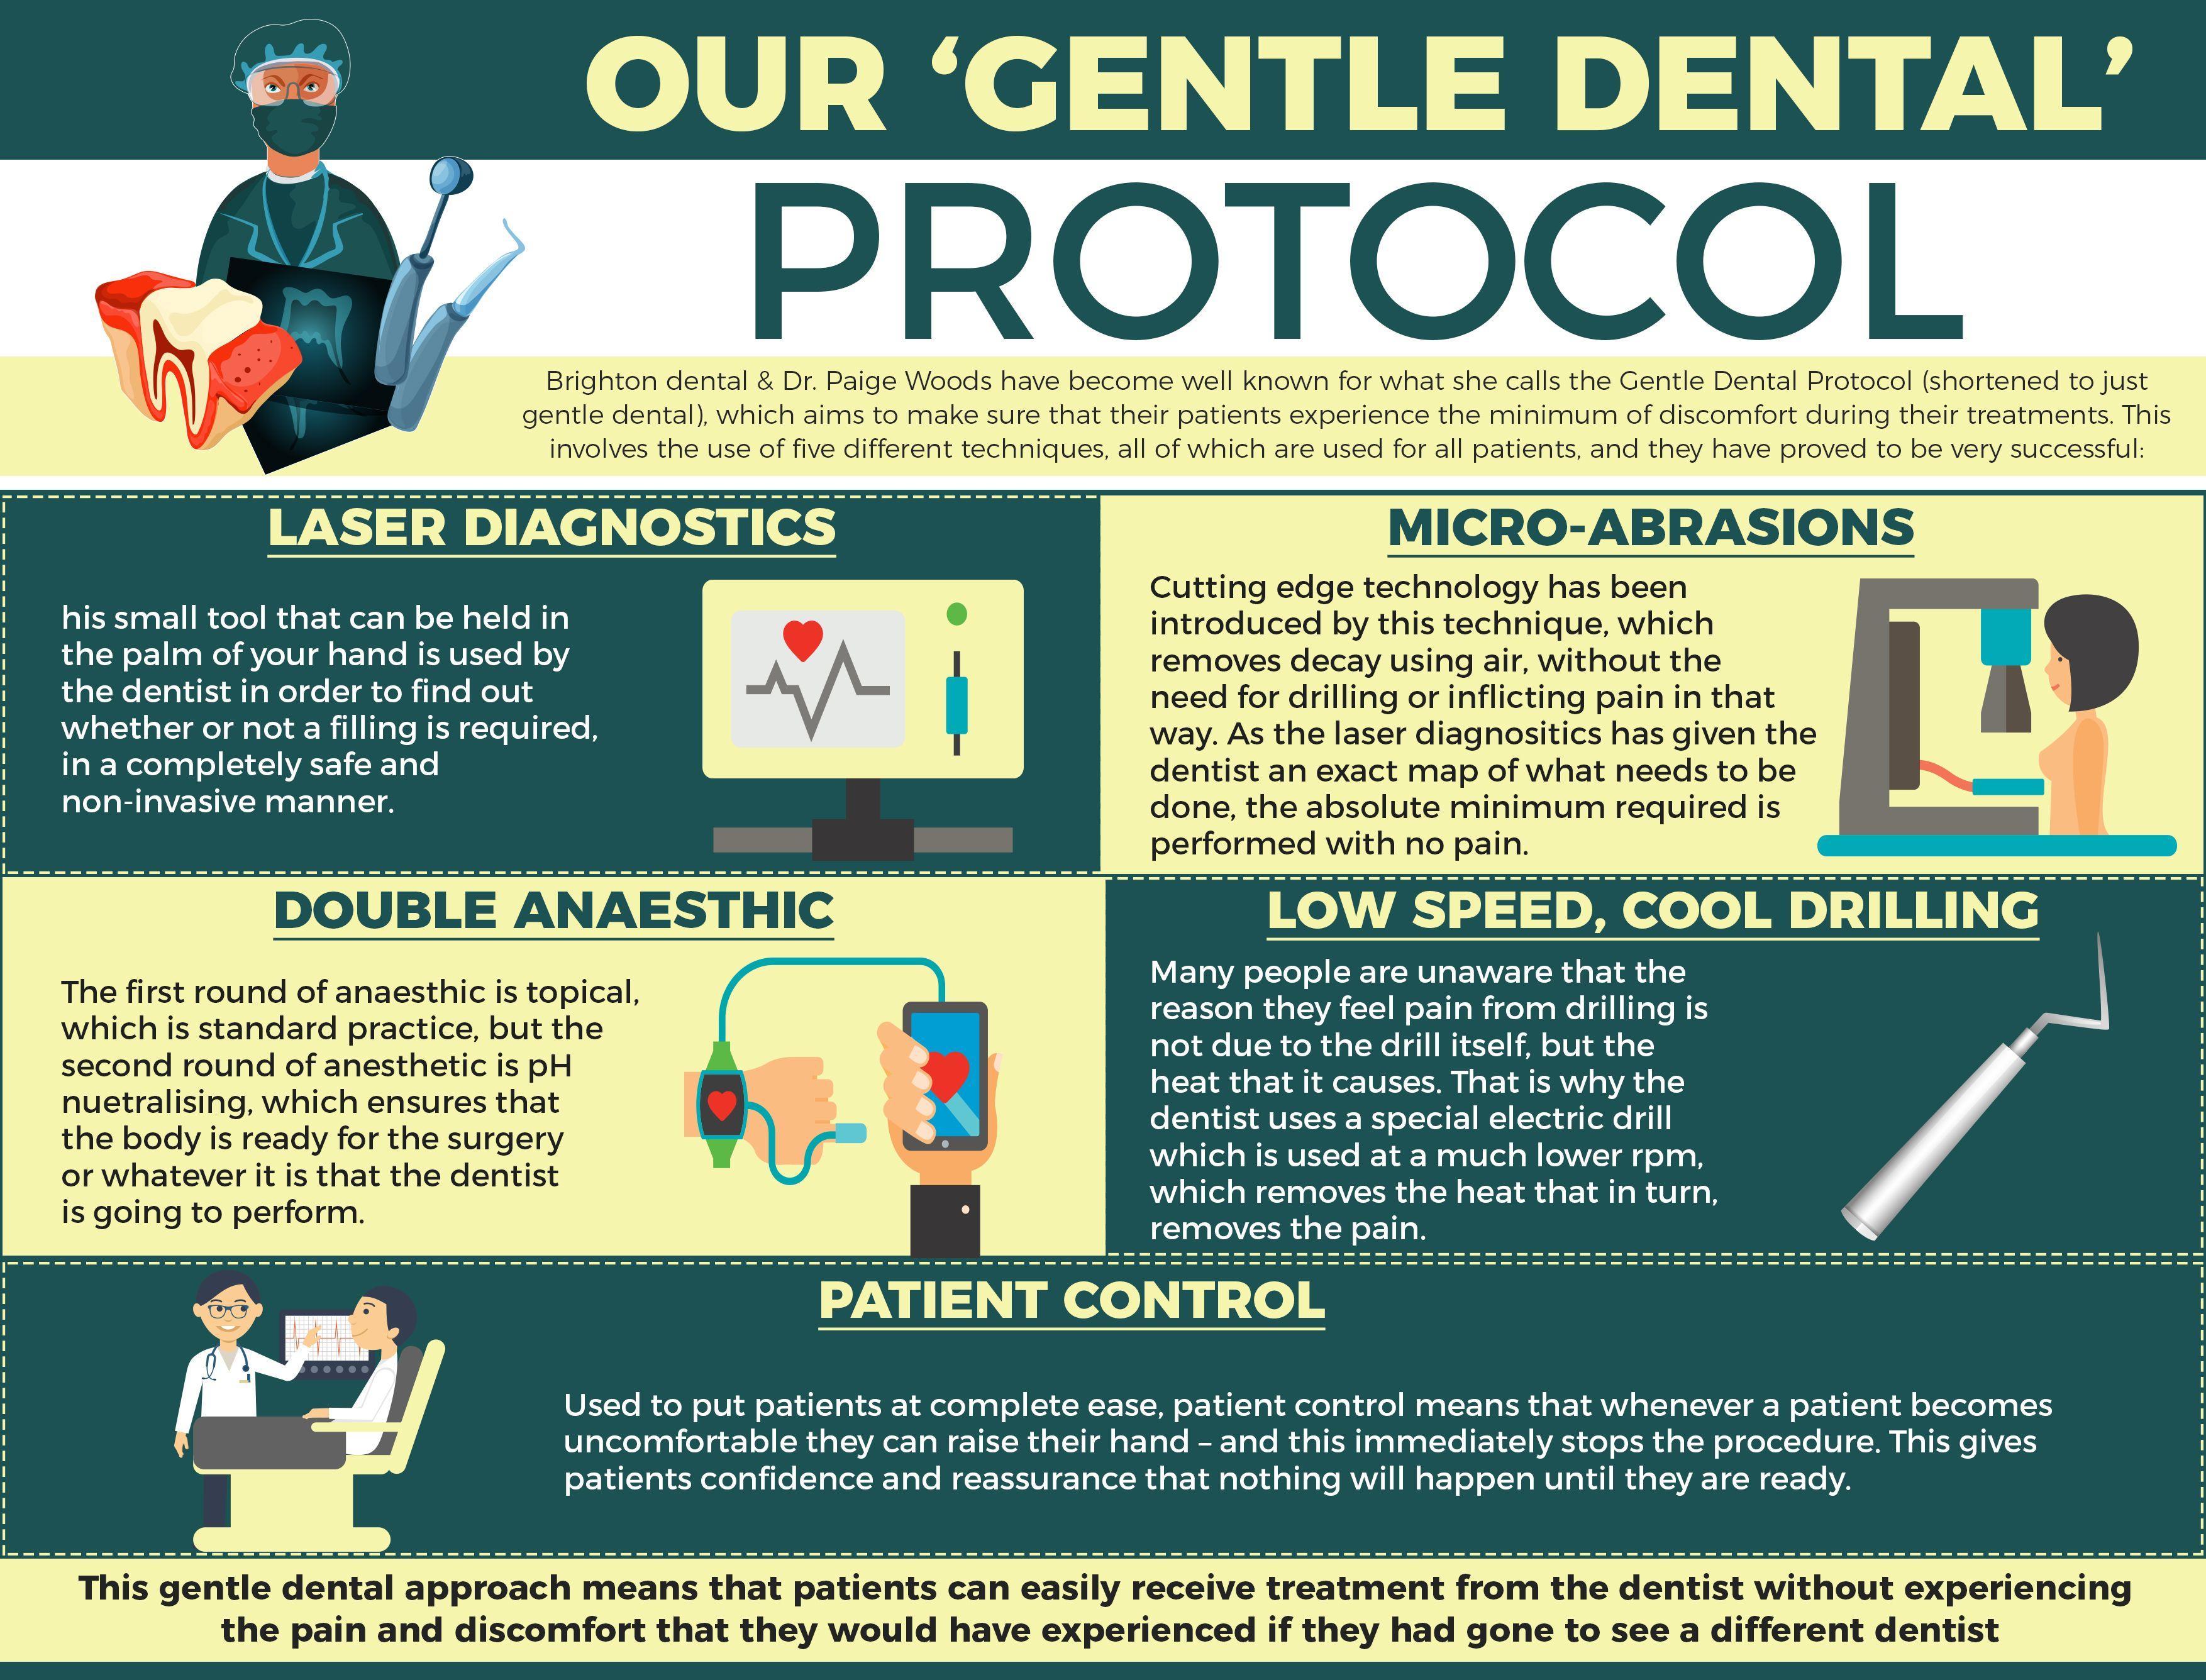 Brighton S Gentle Dental Protocol Holistic Dentist Dental Brighton